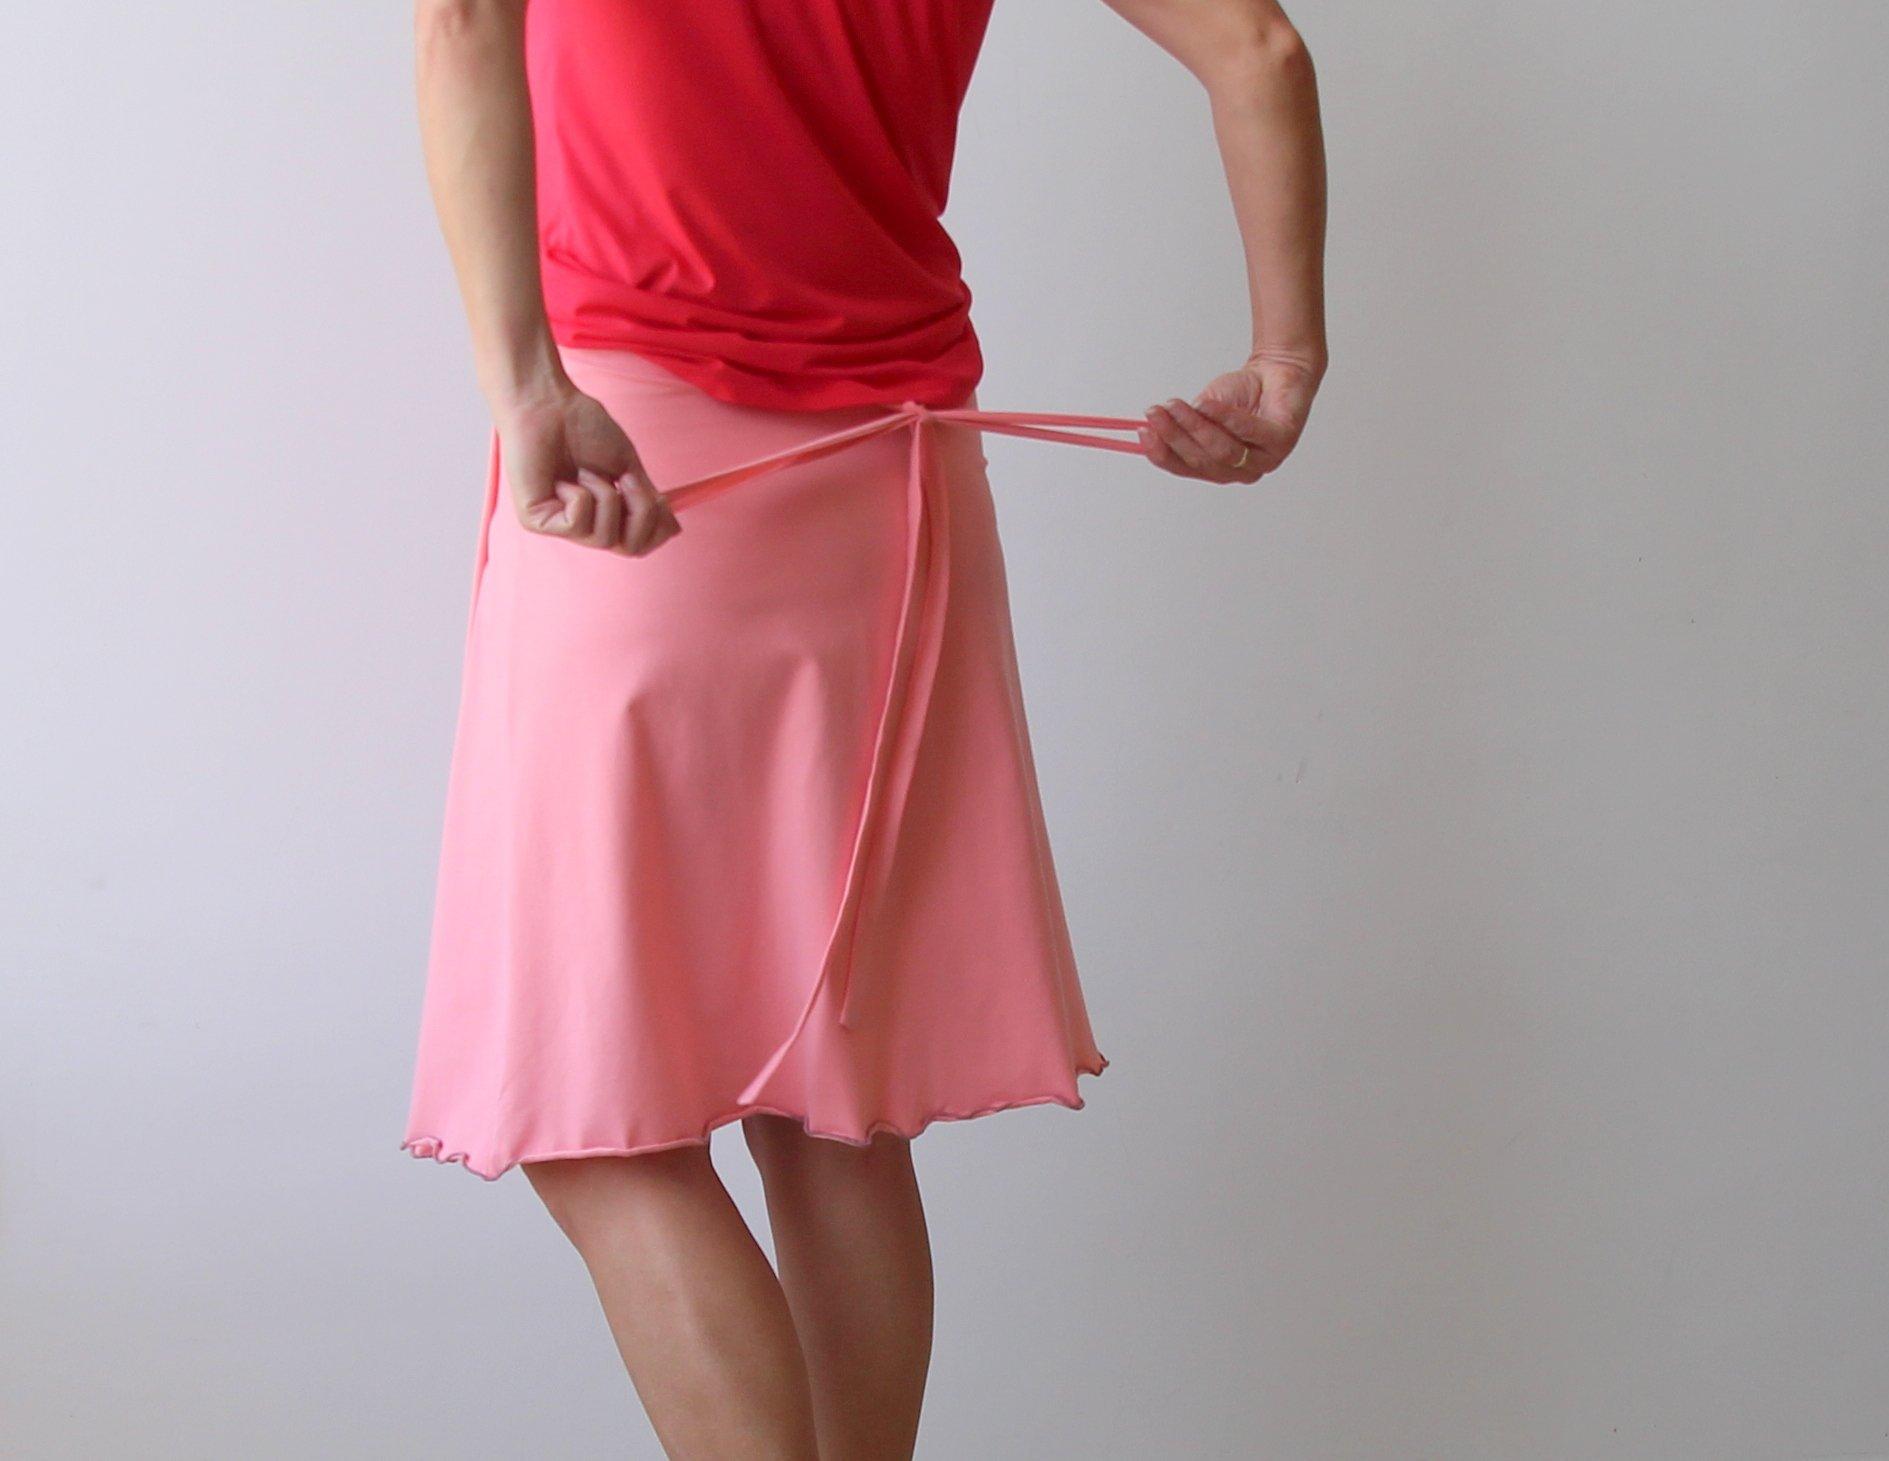 Wrap skirt, Cotton lycra skirt, Summer skirt, Pink skirt, Handmade skirt